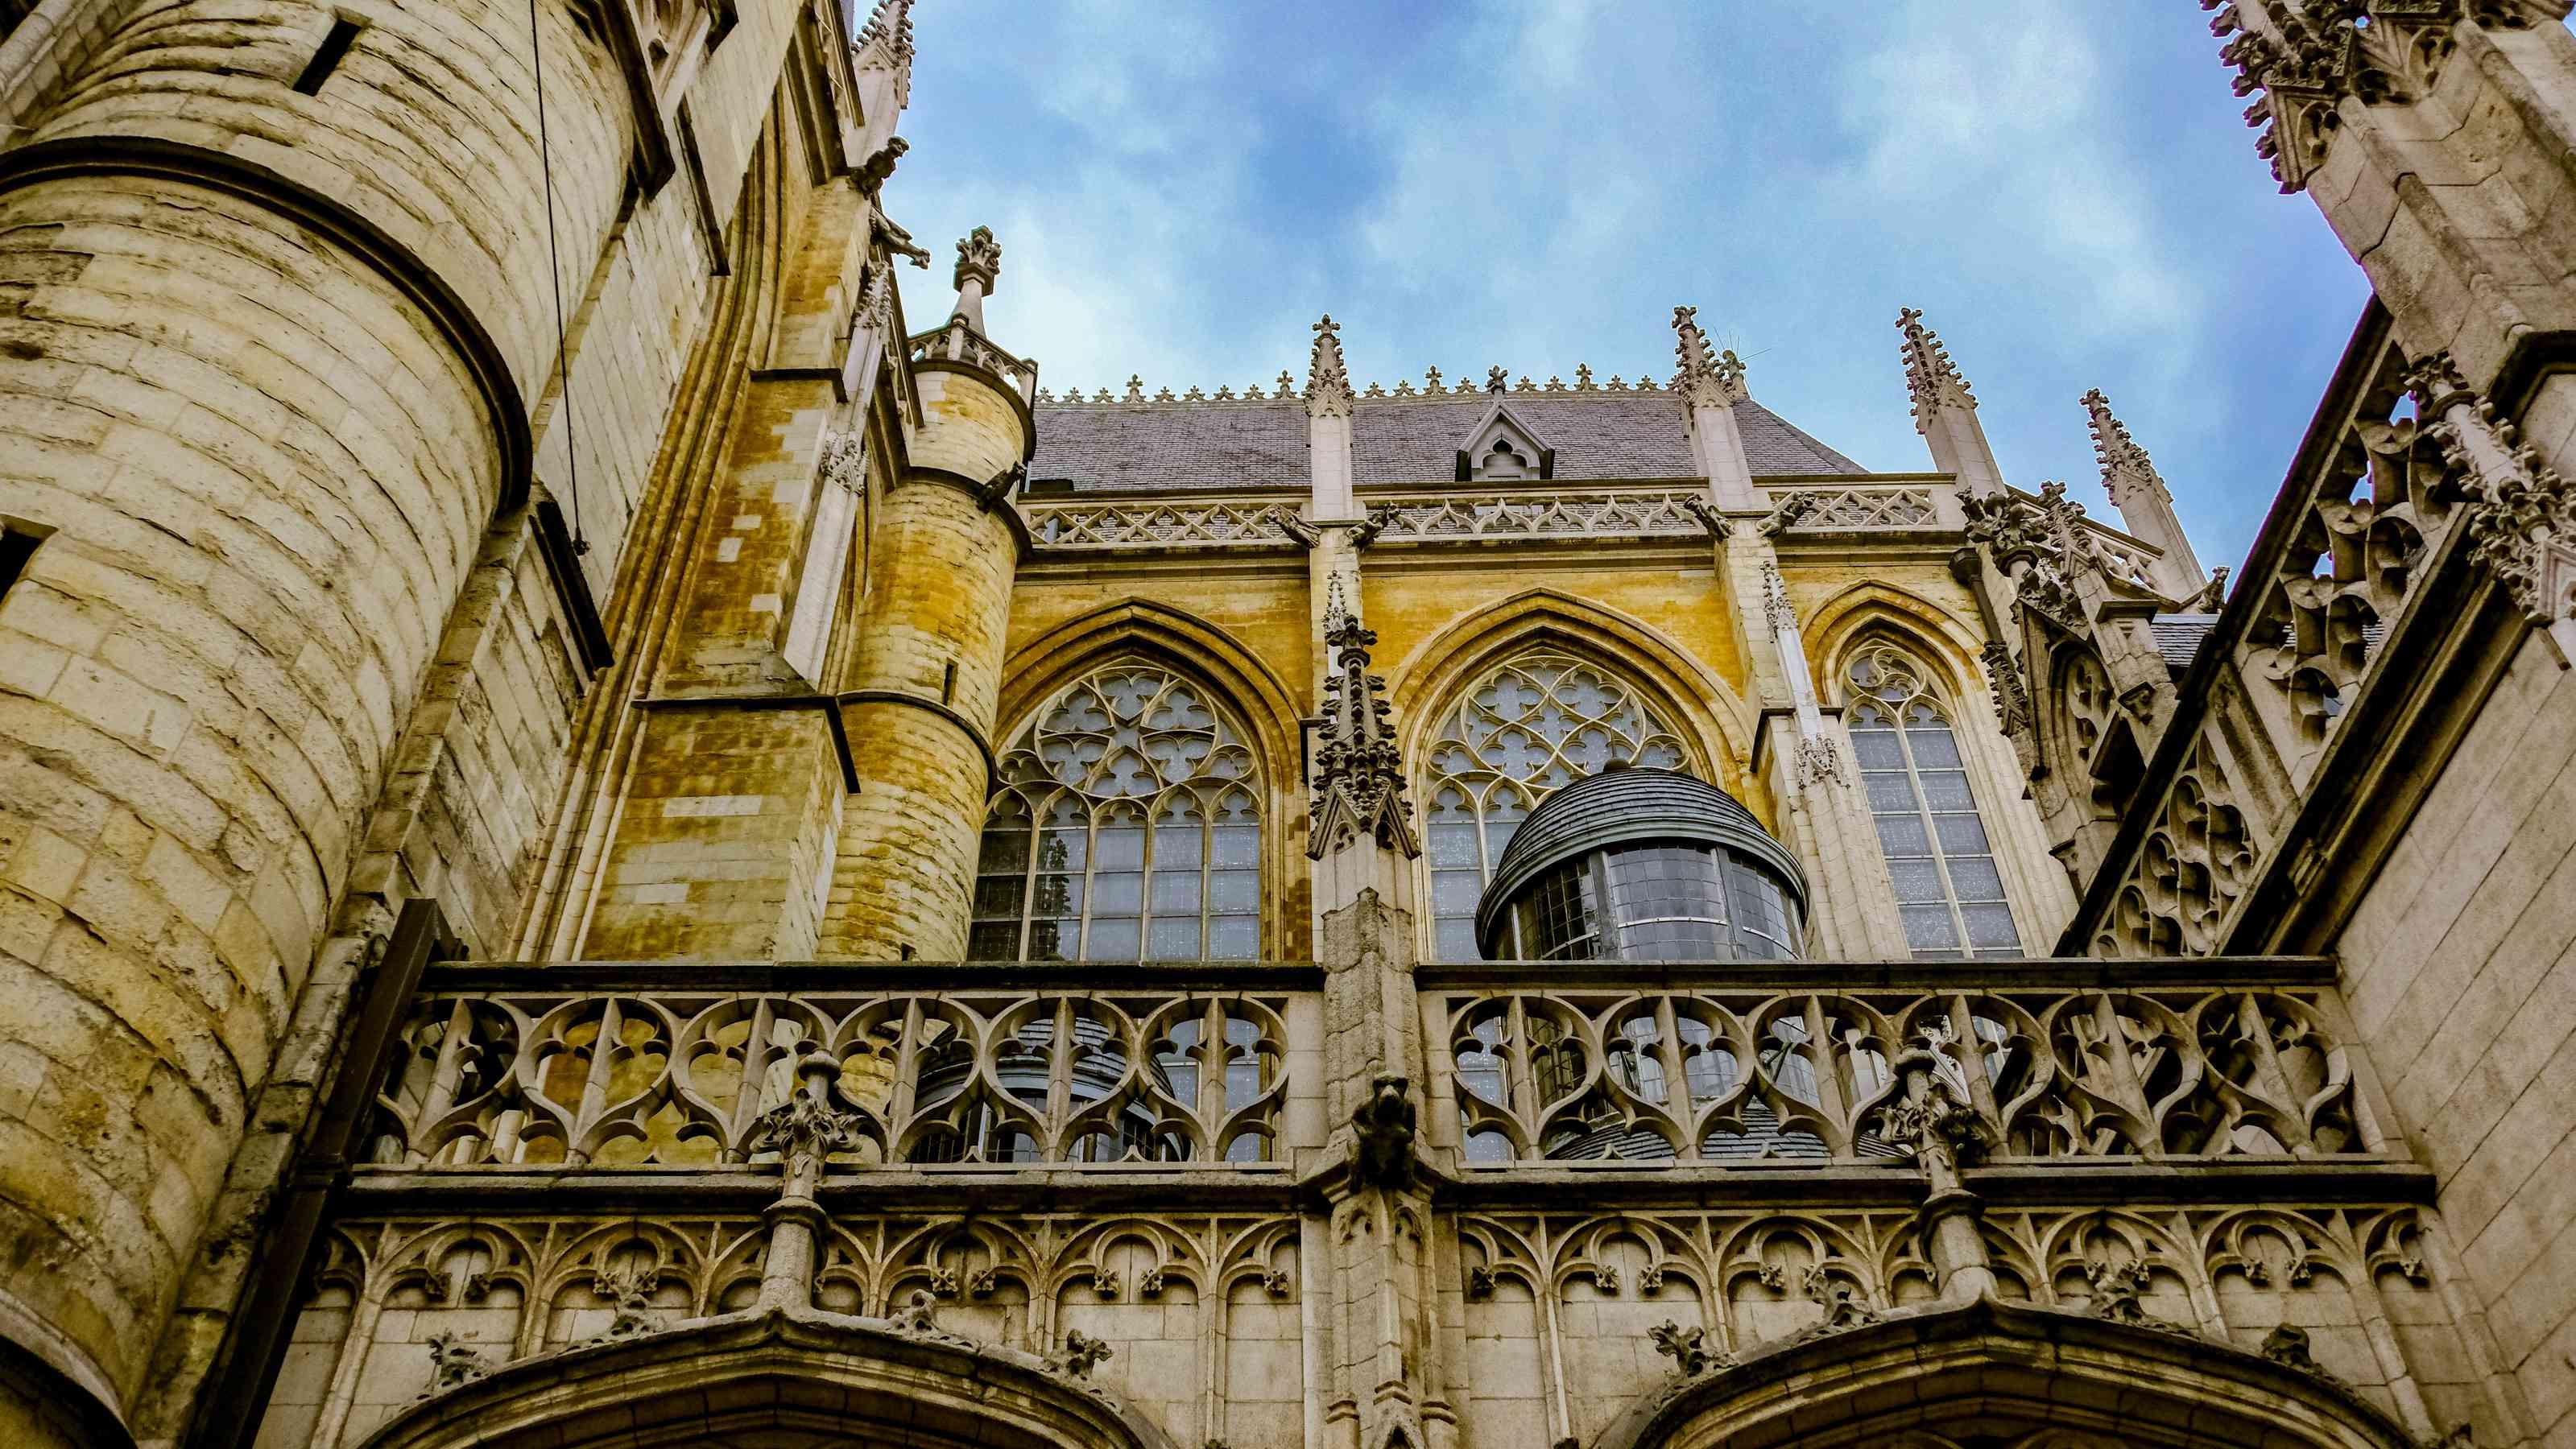 The ornate facade of Notre Dame Du Sablon